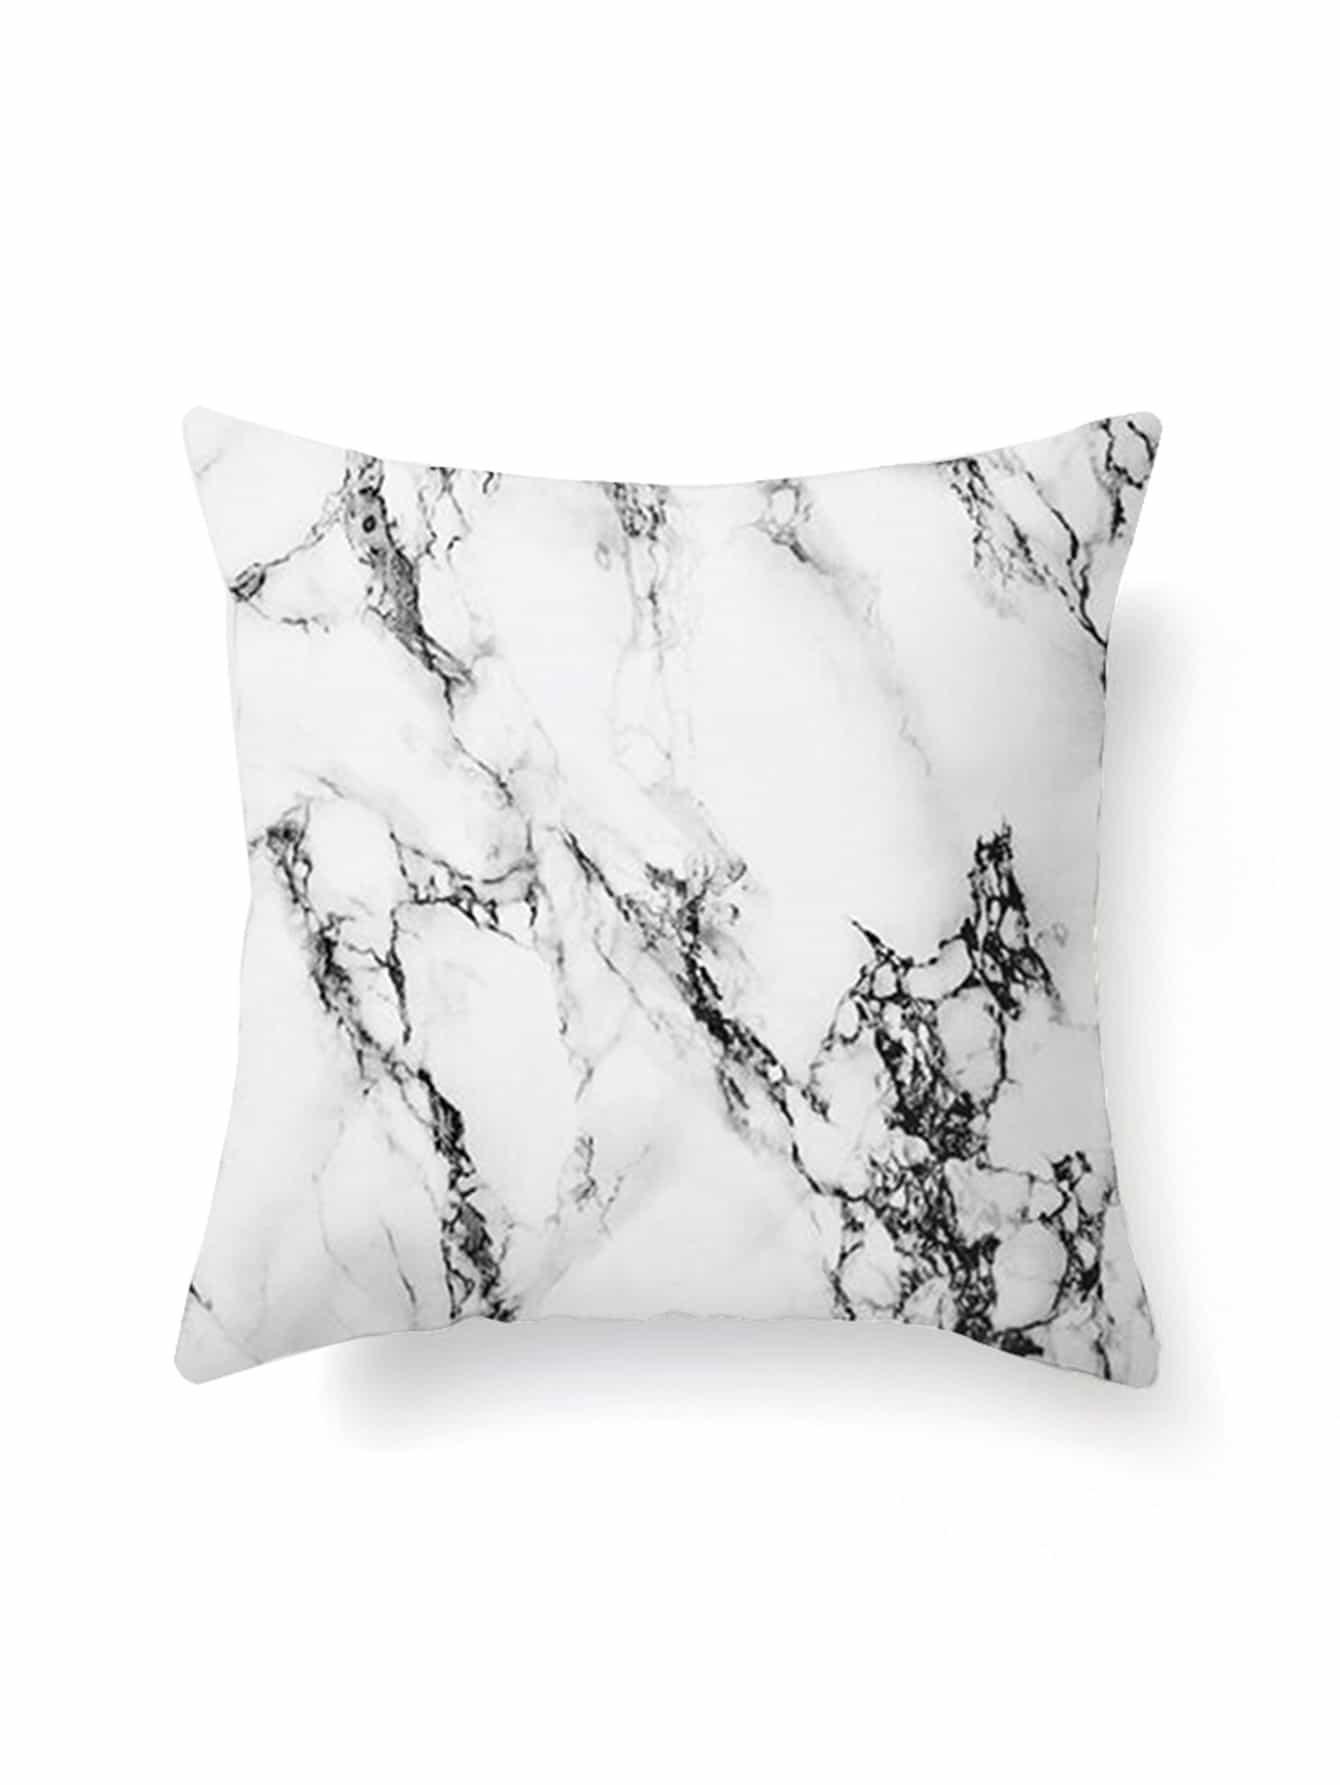 Marble Print Pillowcase Cover